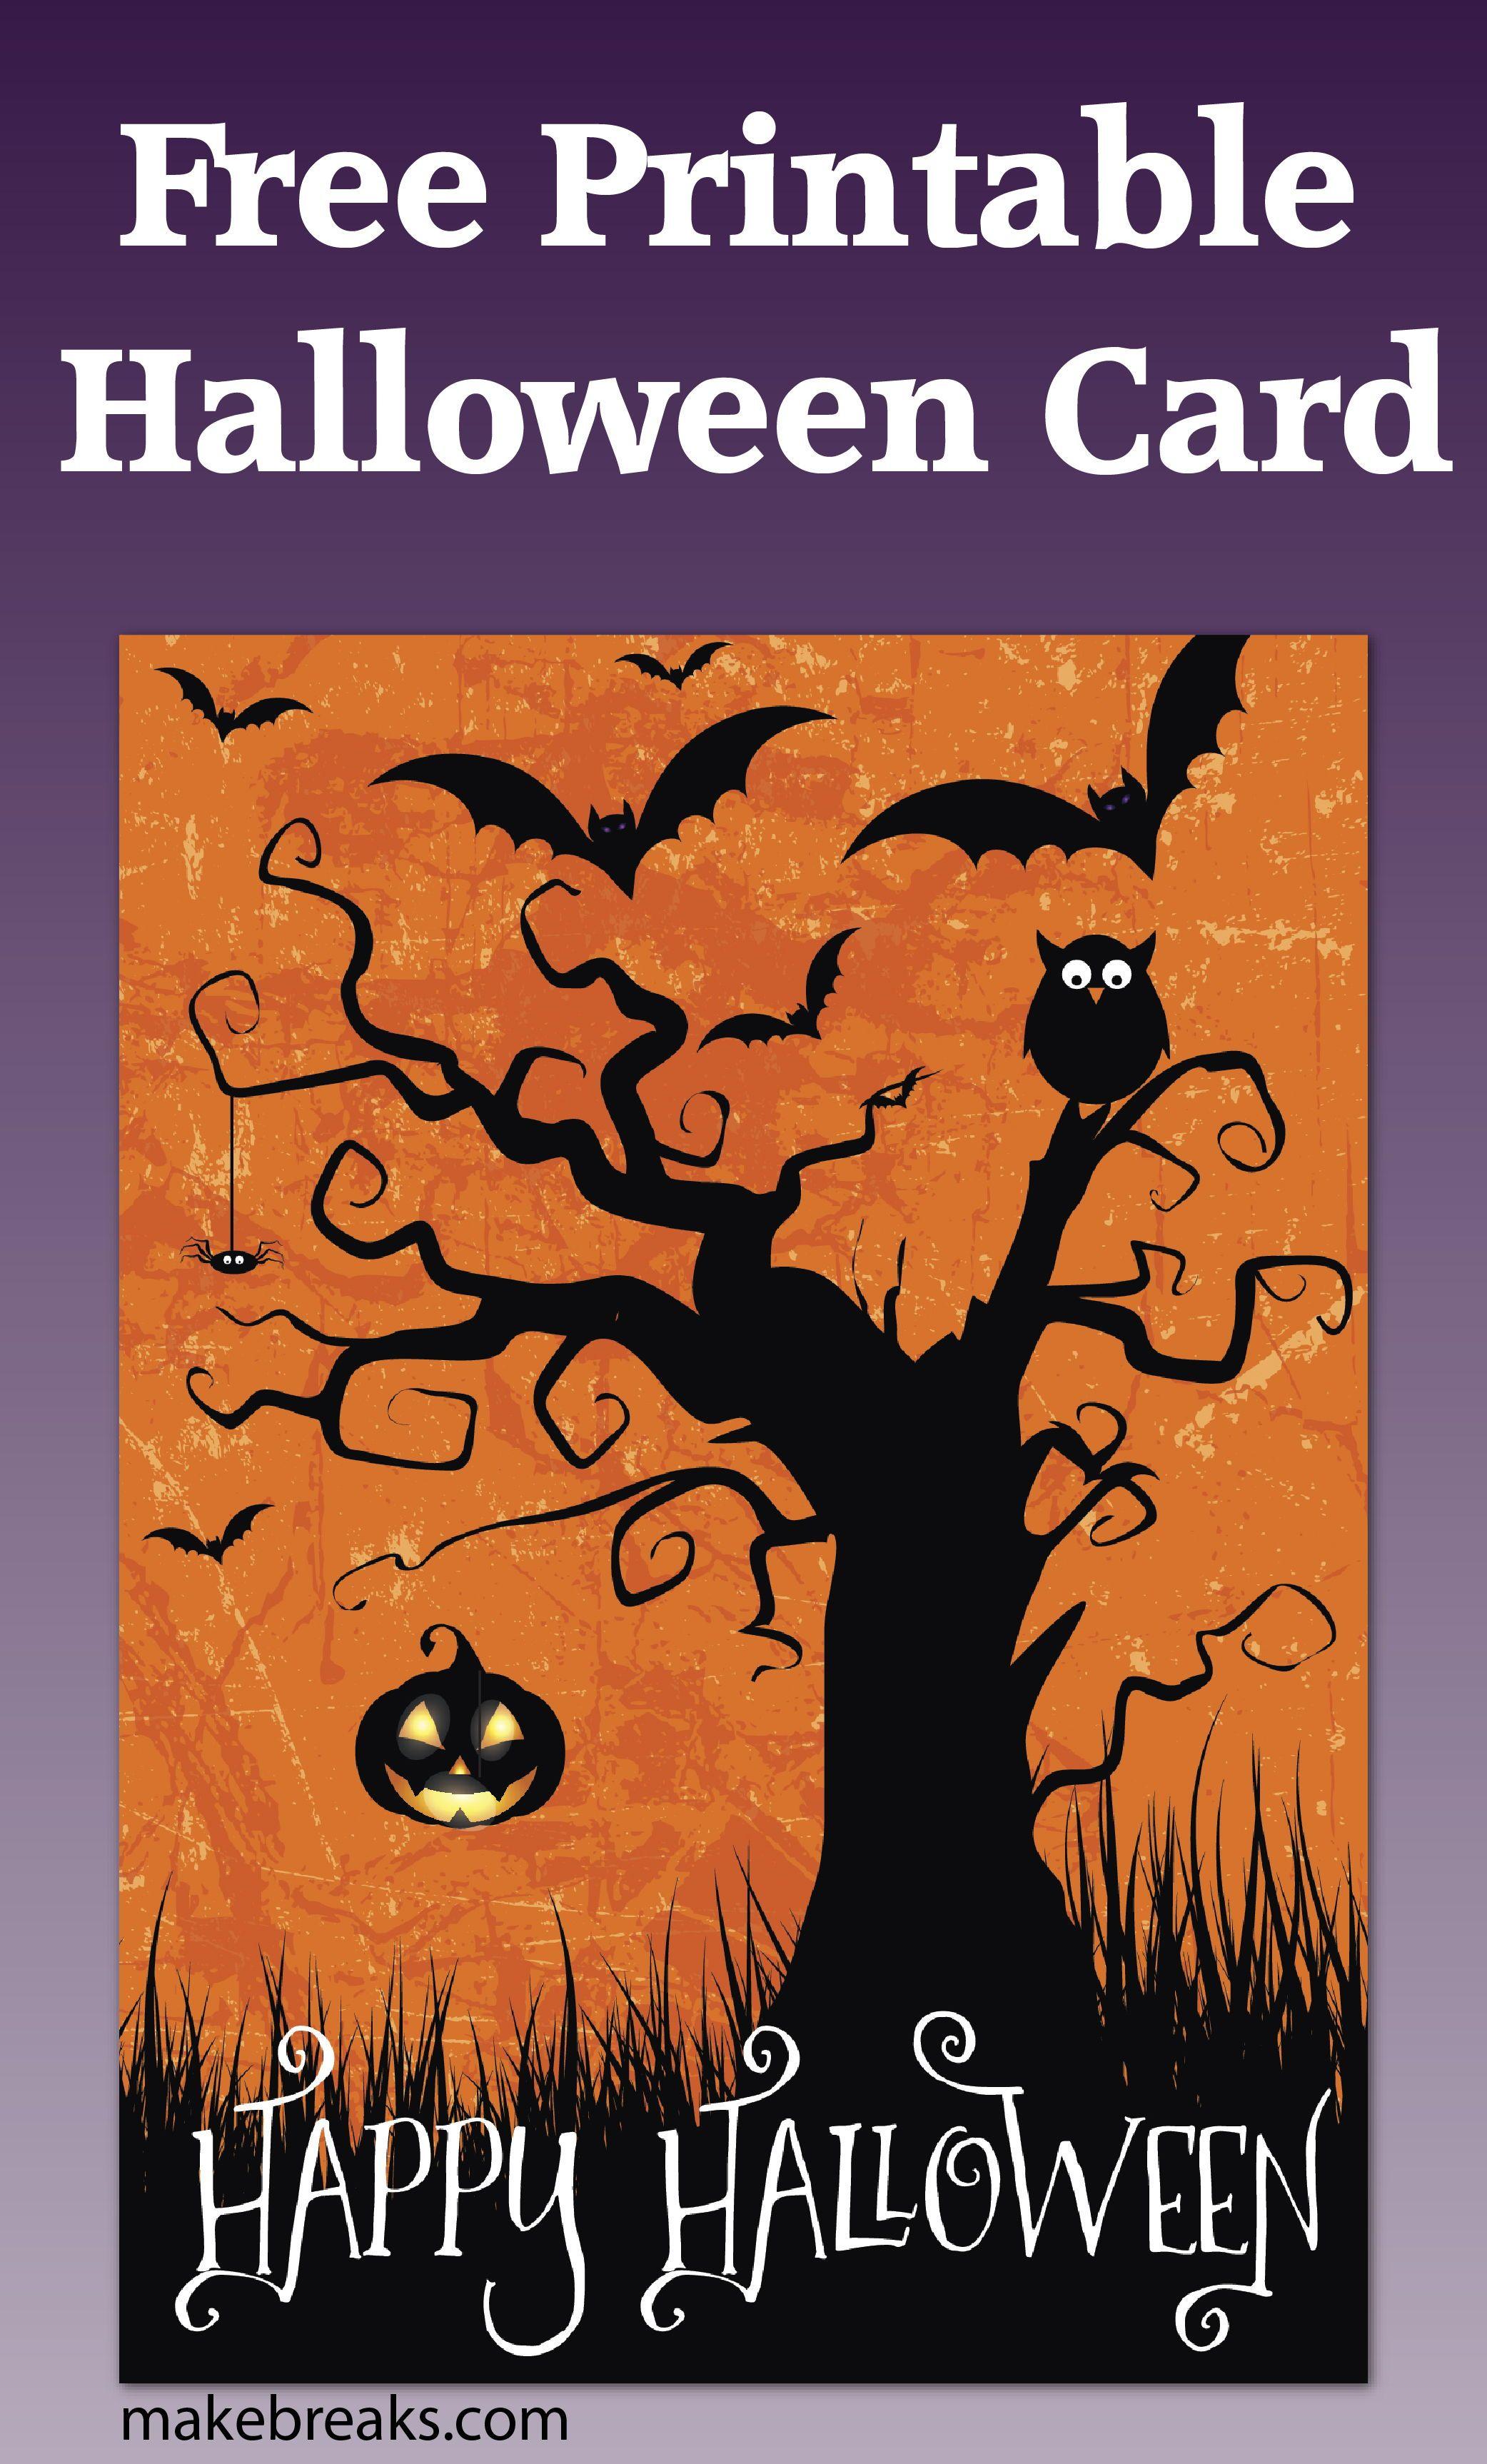 Free Printable Happy Halloween Card Or Party Invitation Make Breaks Halloween Greetings Halloween Cards Happy Halloween Cards